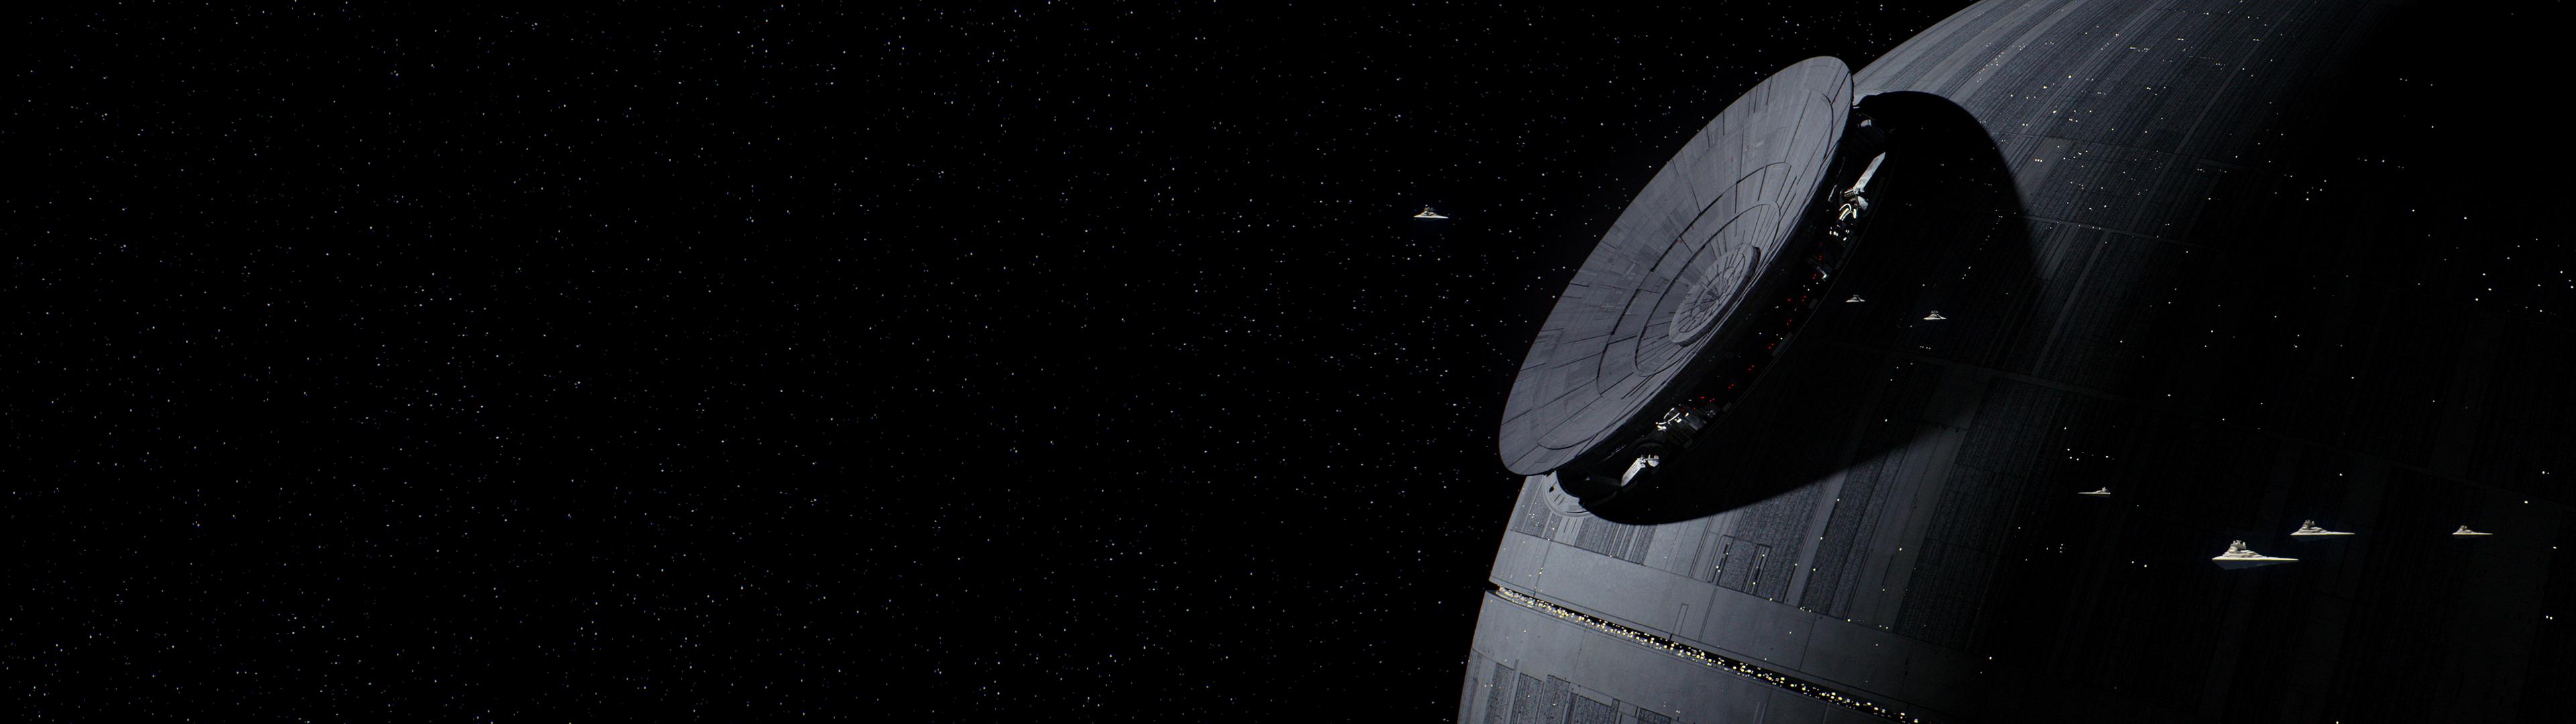 Death Star Star Wars Space 3840x1080 Wallpaper Wallhaven Cc